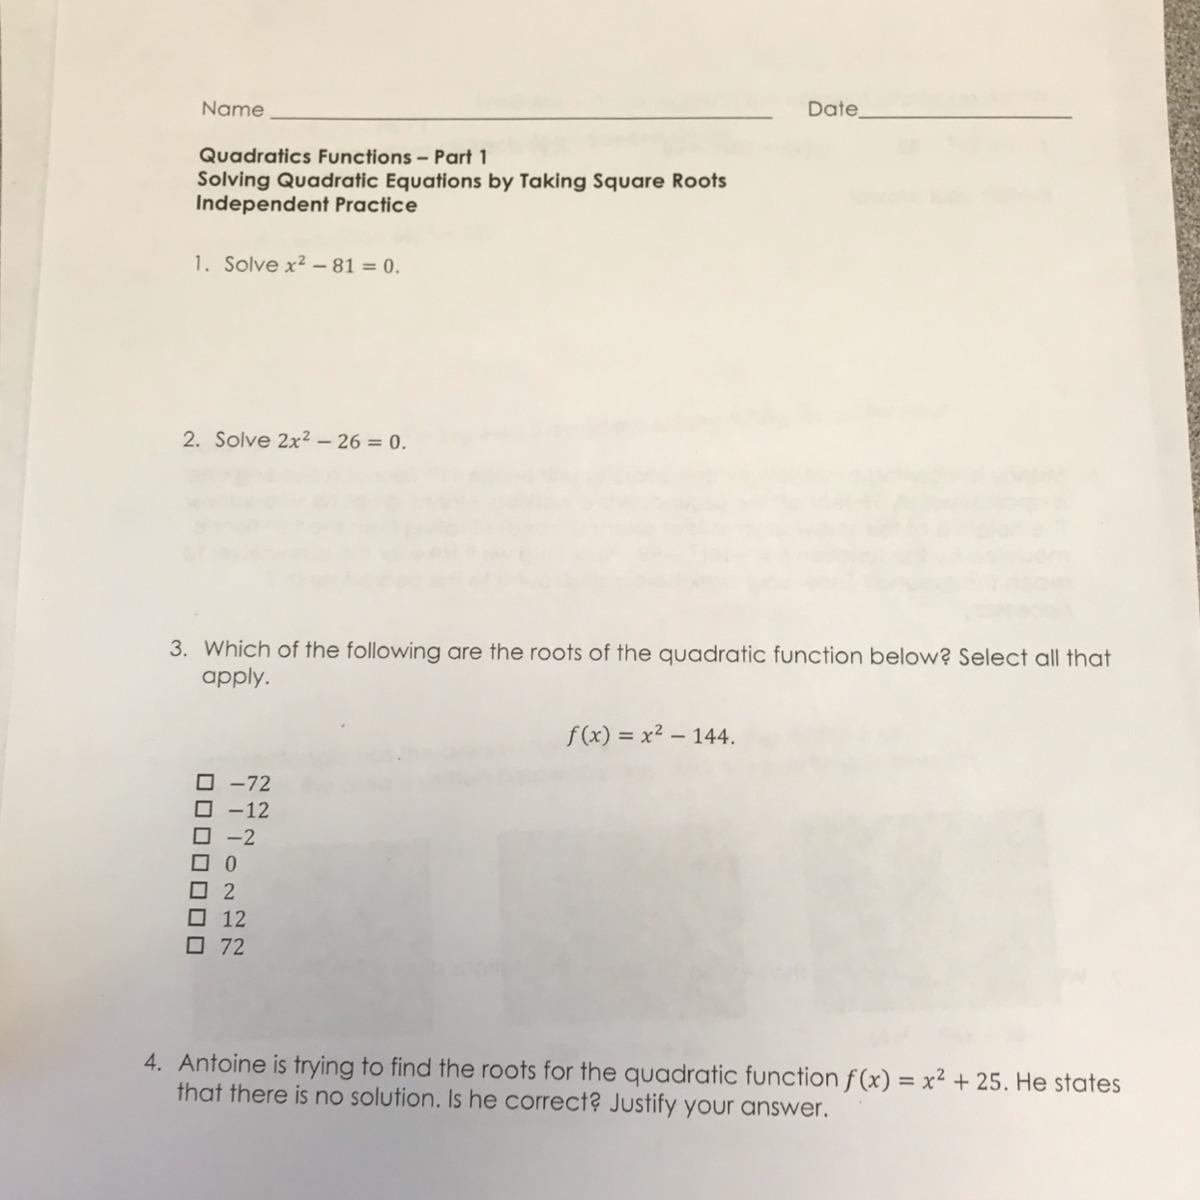 Solve Quadratic Equation X 4 81 0